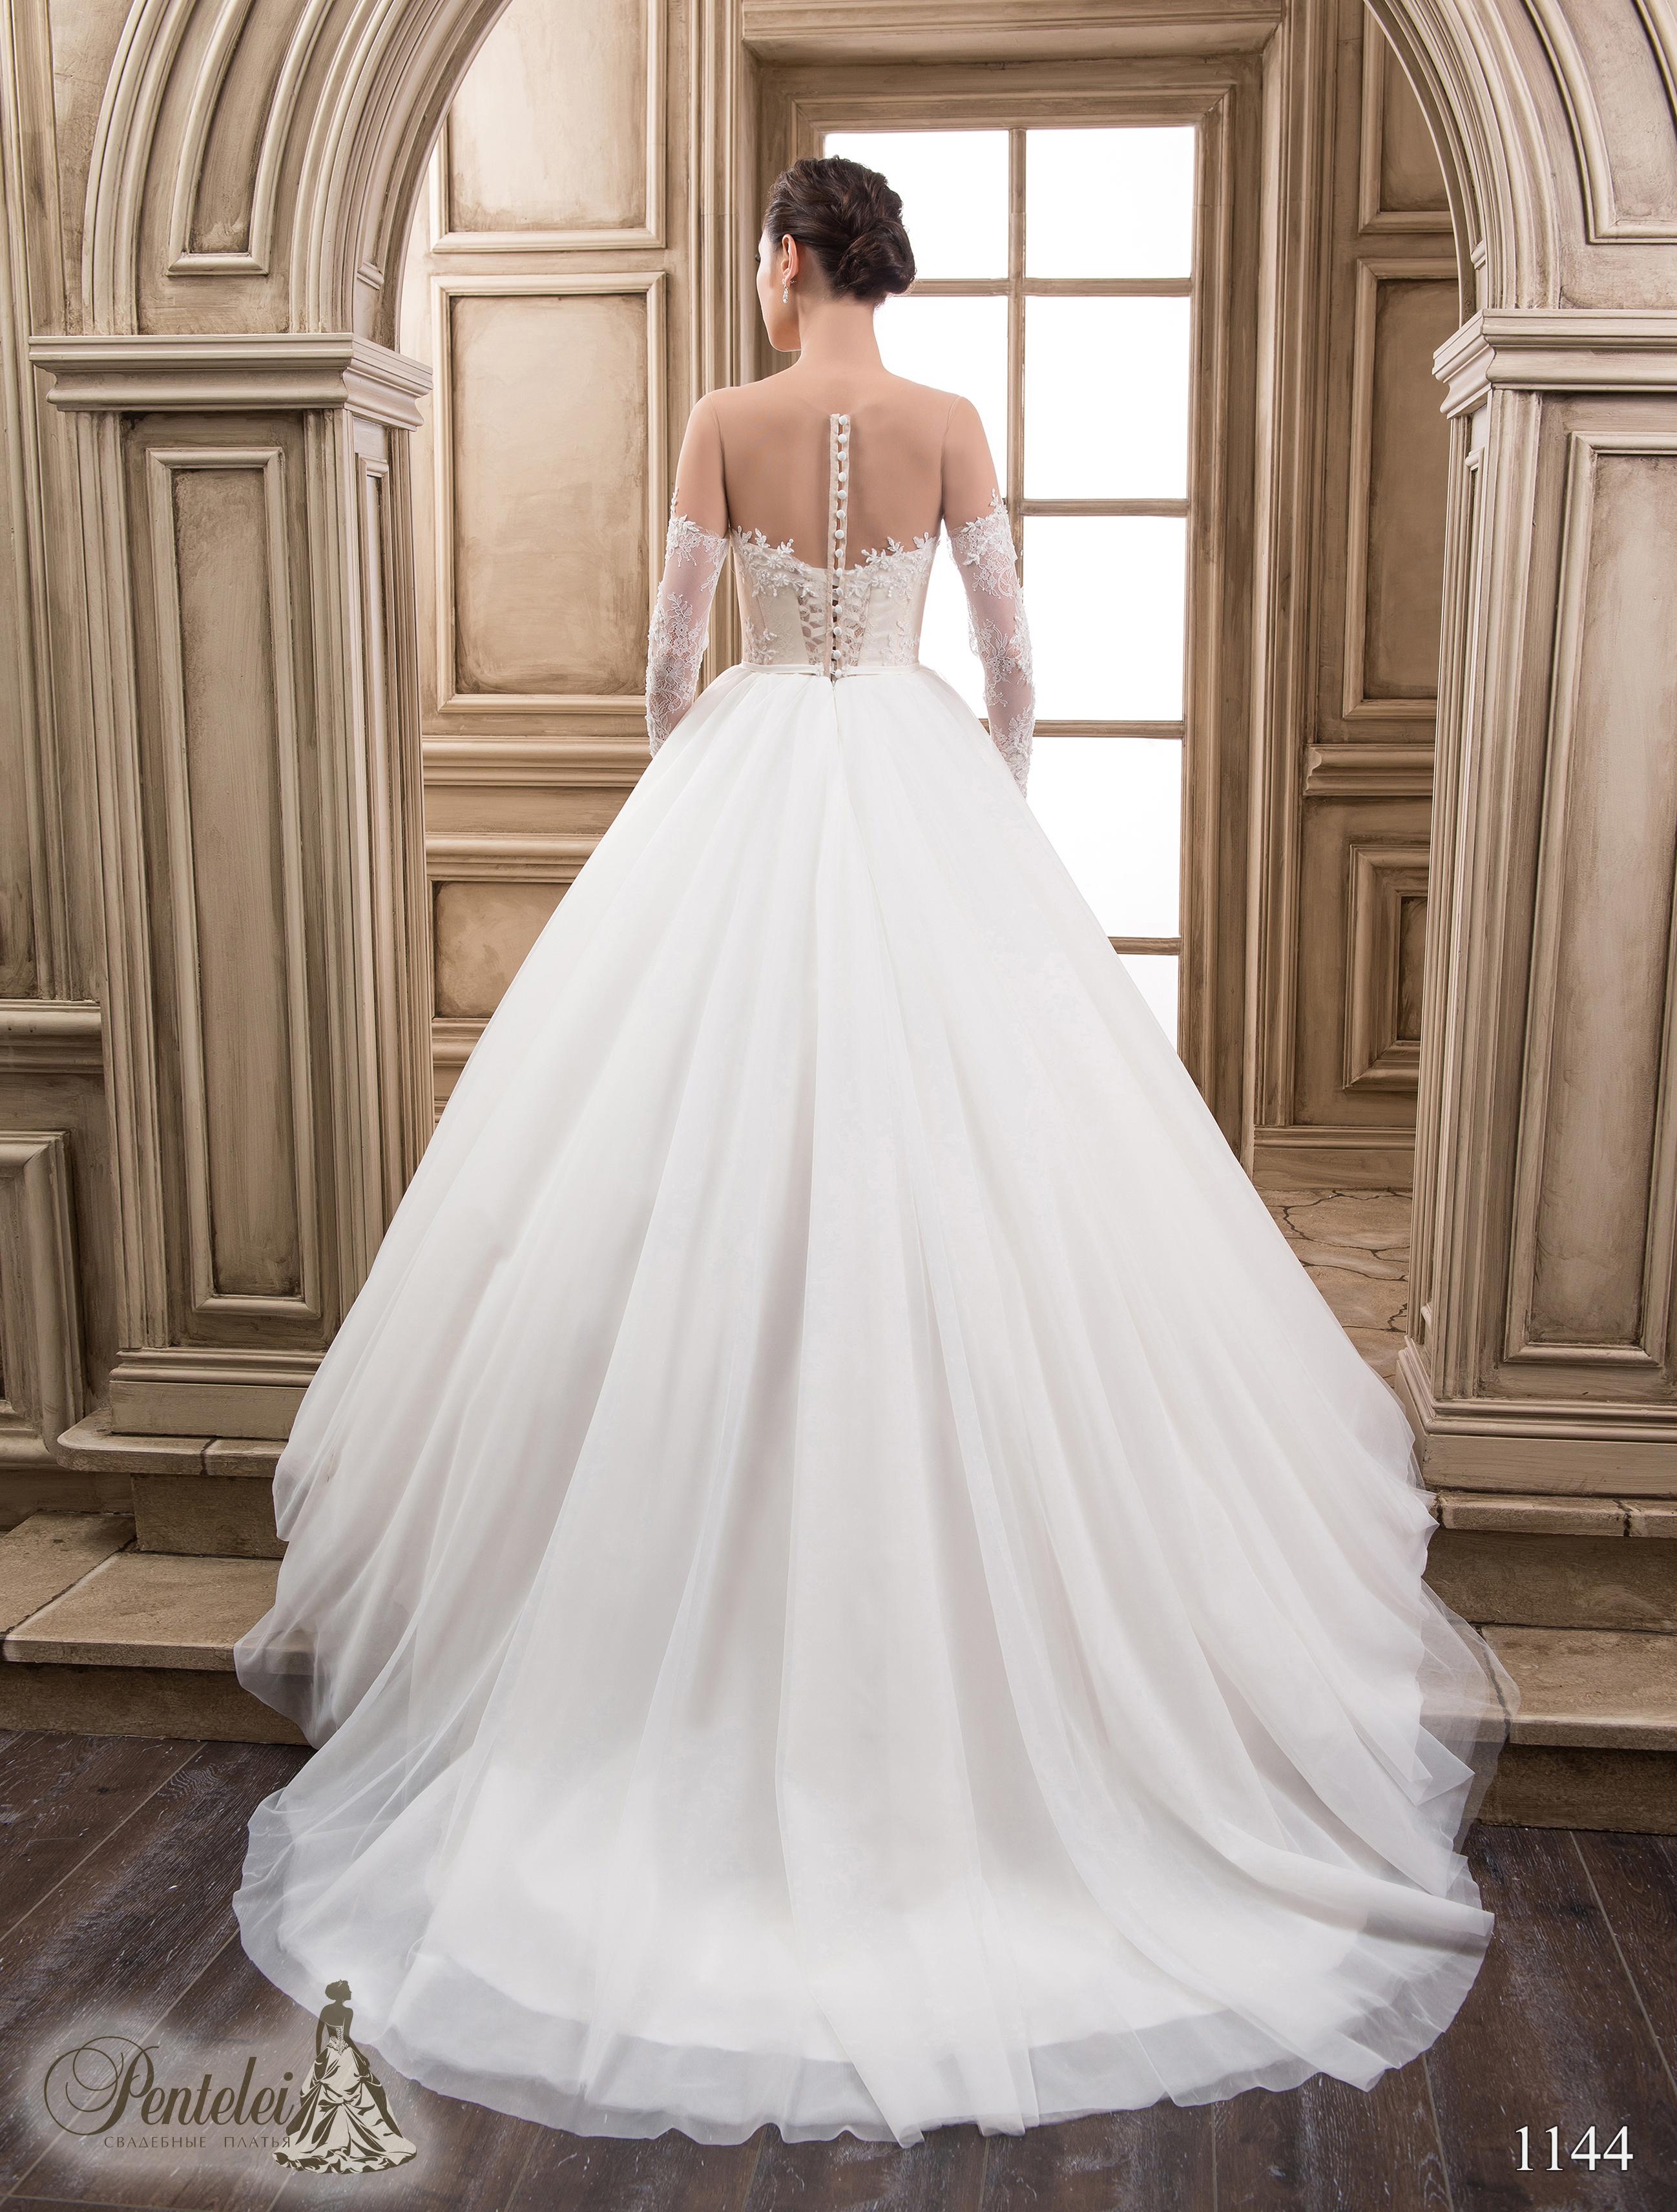 1144 | Buy wedding dresses wholesale from Pentelei